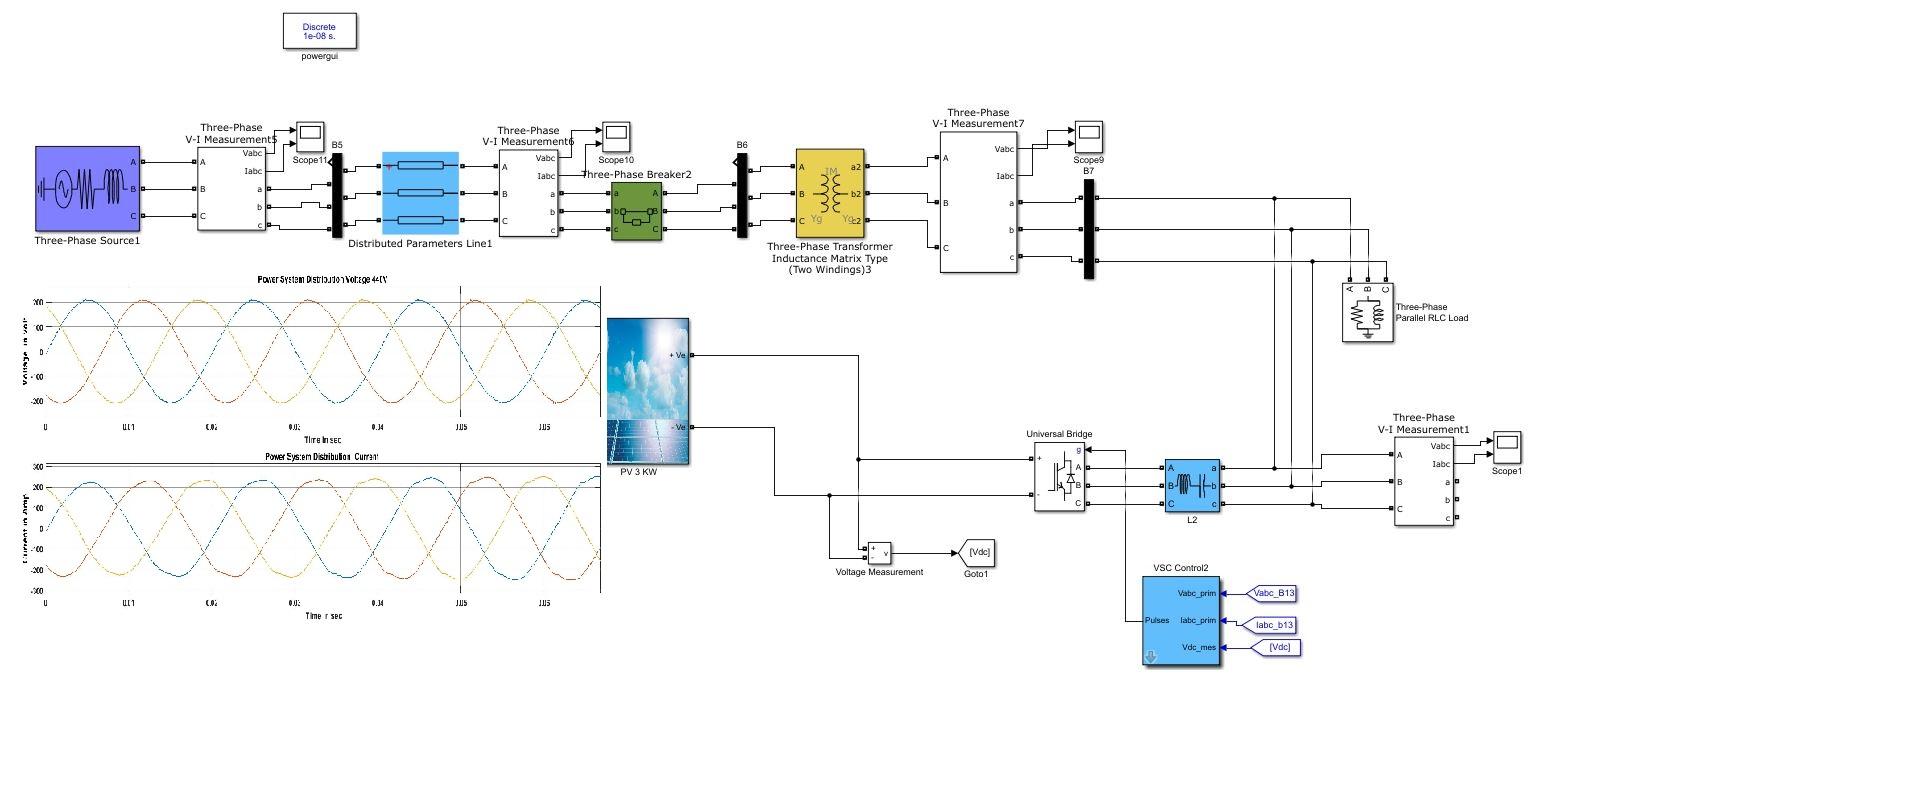 Dr Venkatesh Kumar M Matlab Central Rlc Series Circuit Details Thumbnail